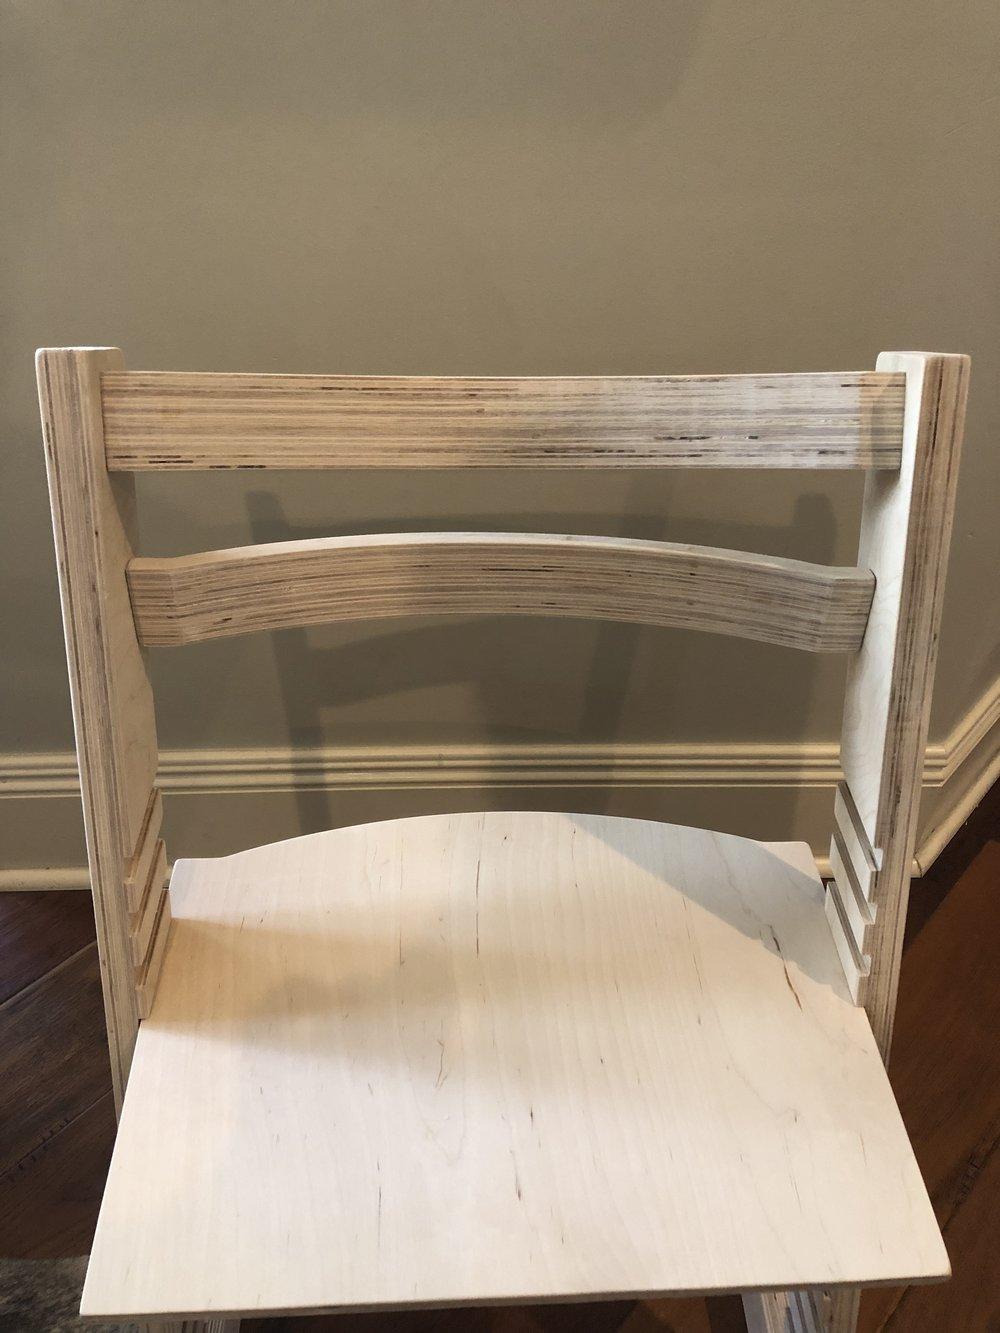 clintloggins Tripptrapp chair.jpeg